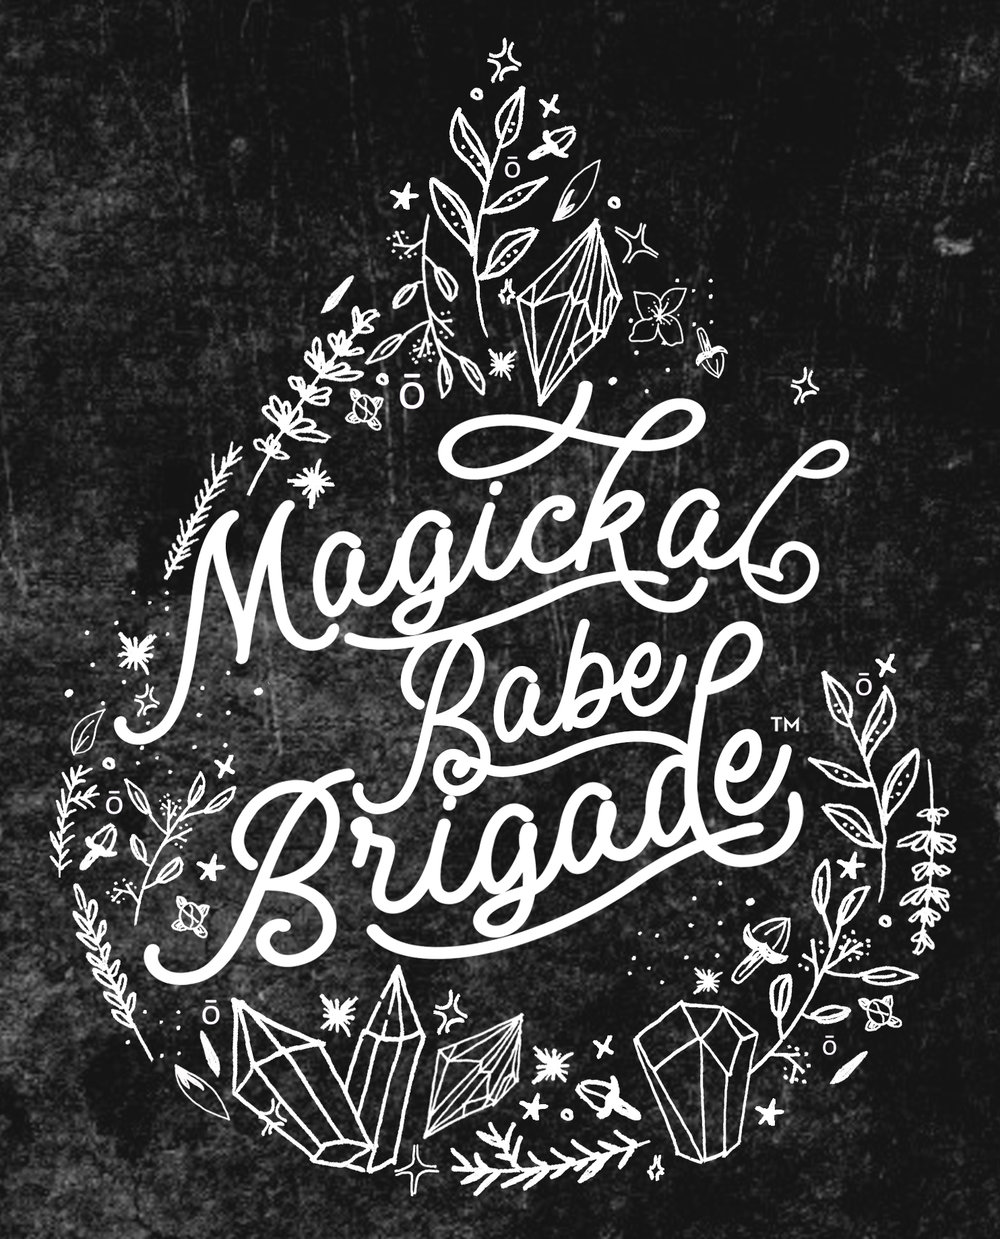 MagickalBabeBrigade_Distressed.jpg